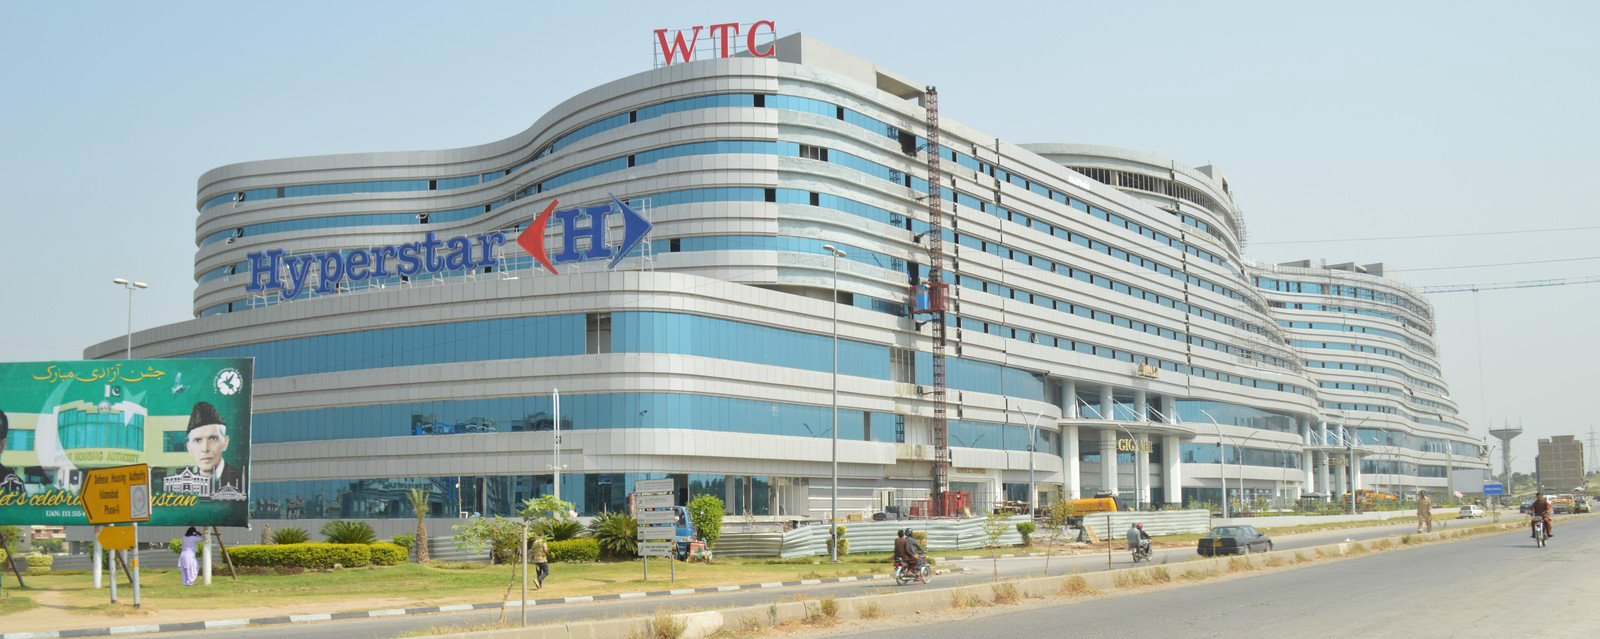 World Trade Center DHA Islamabad, Phase 2